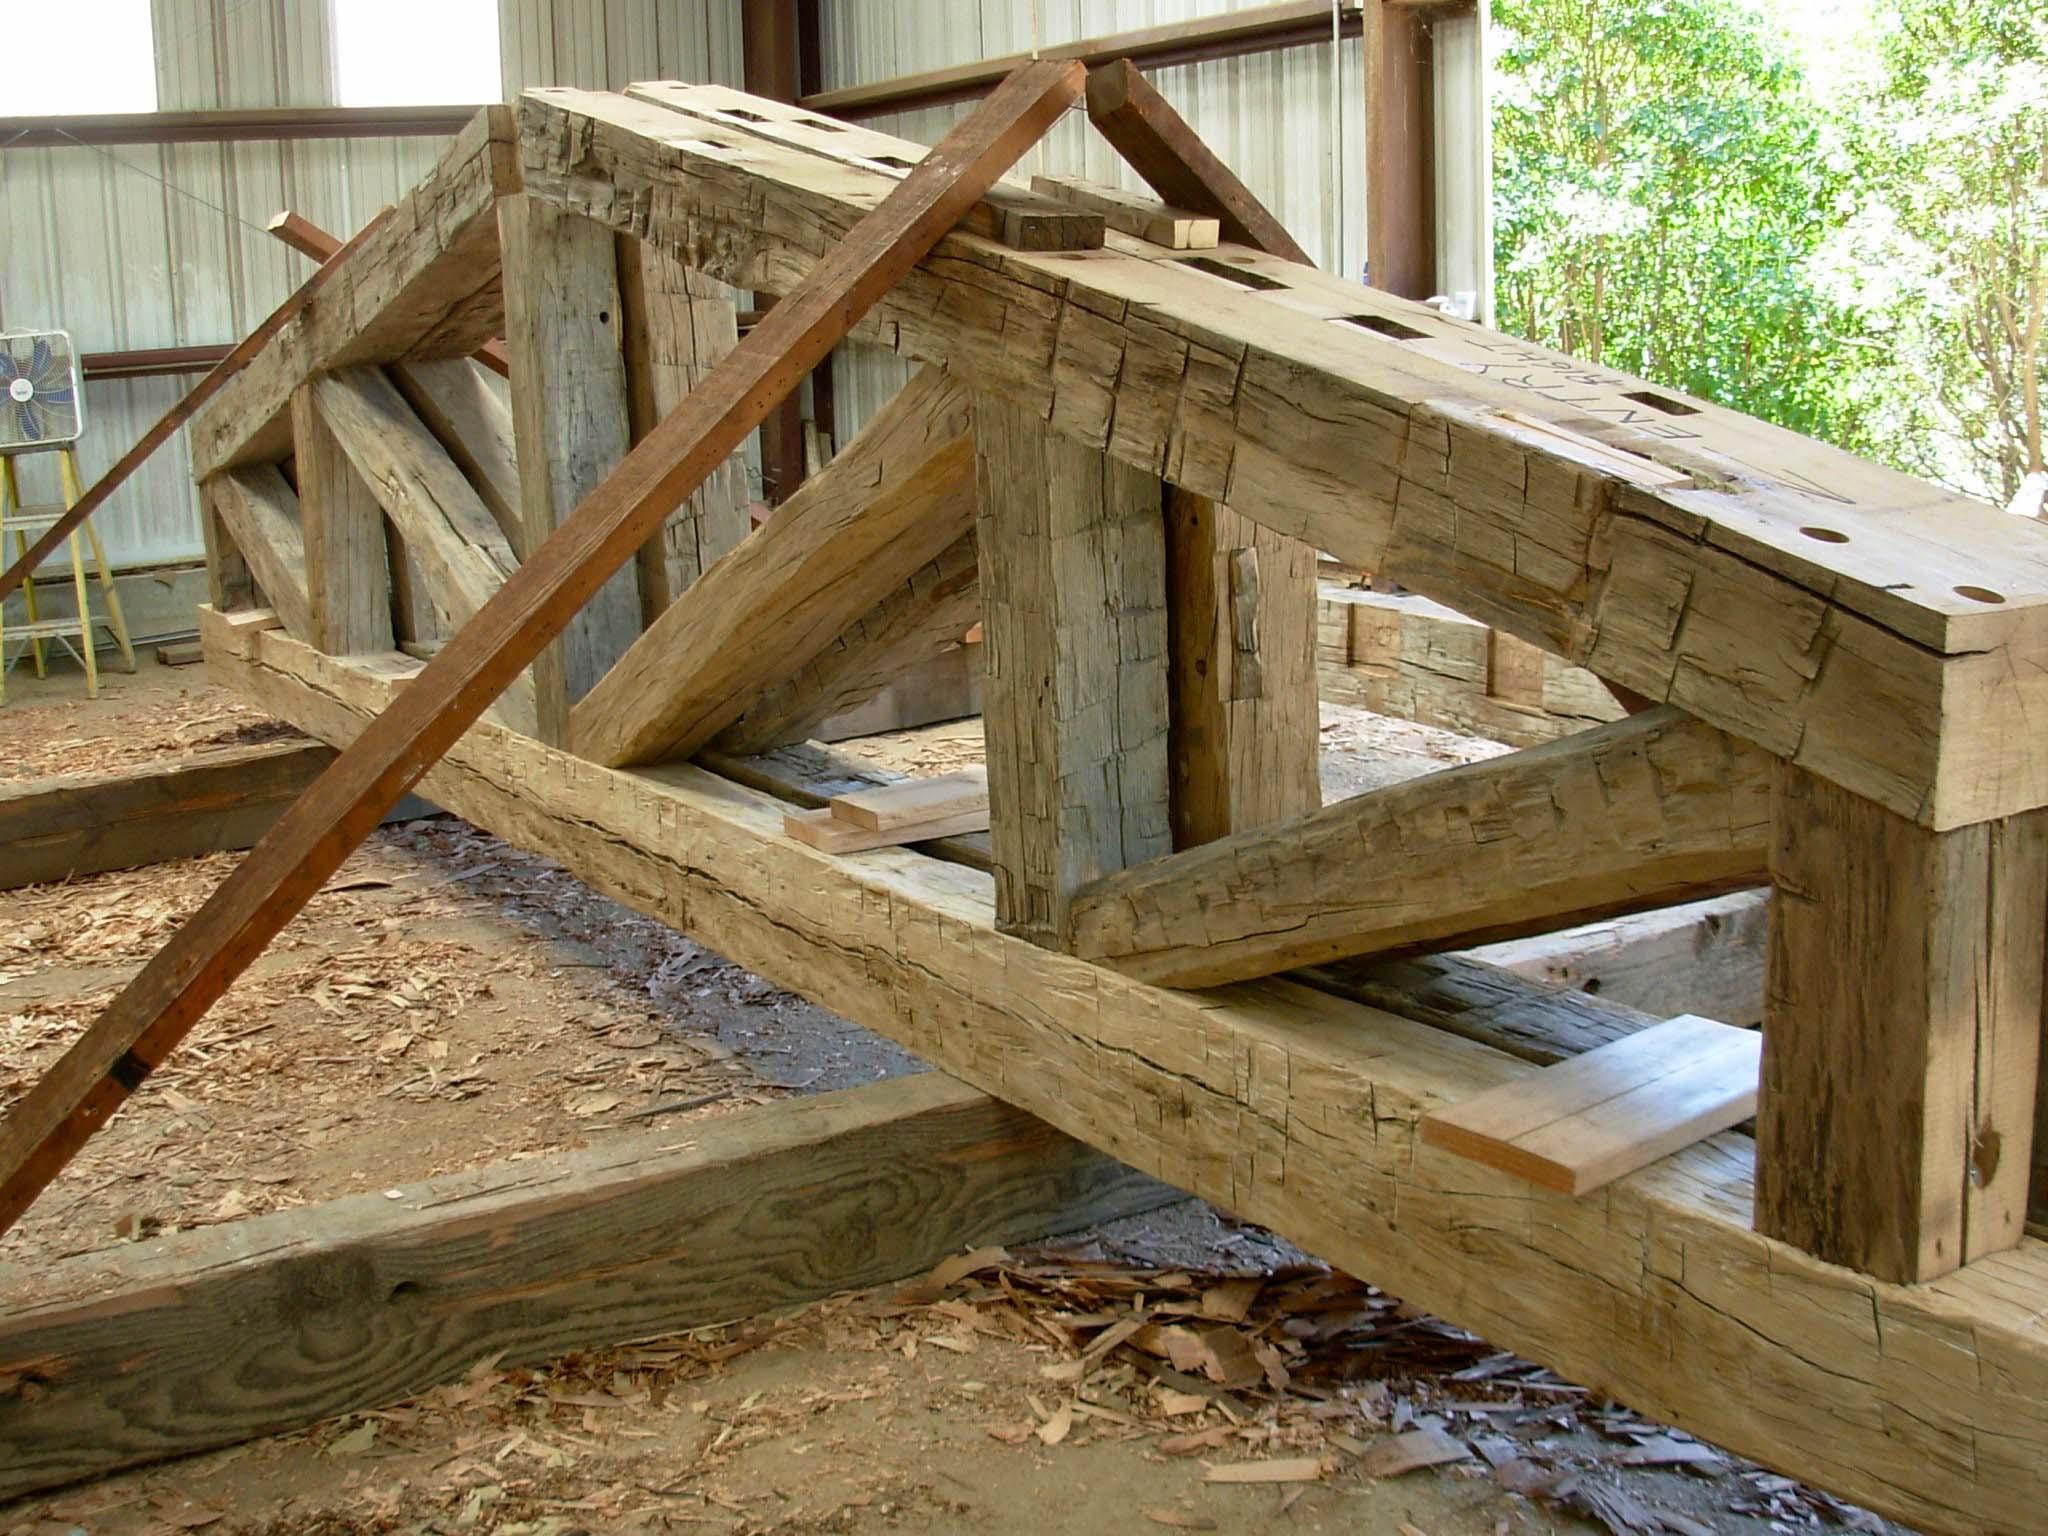 hewn hardwood beams03 - Reclaimed Hardwood Barn Timbers